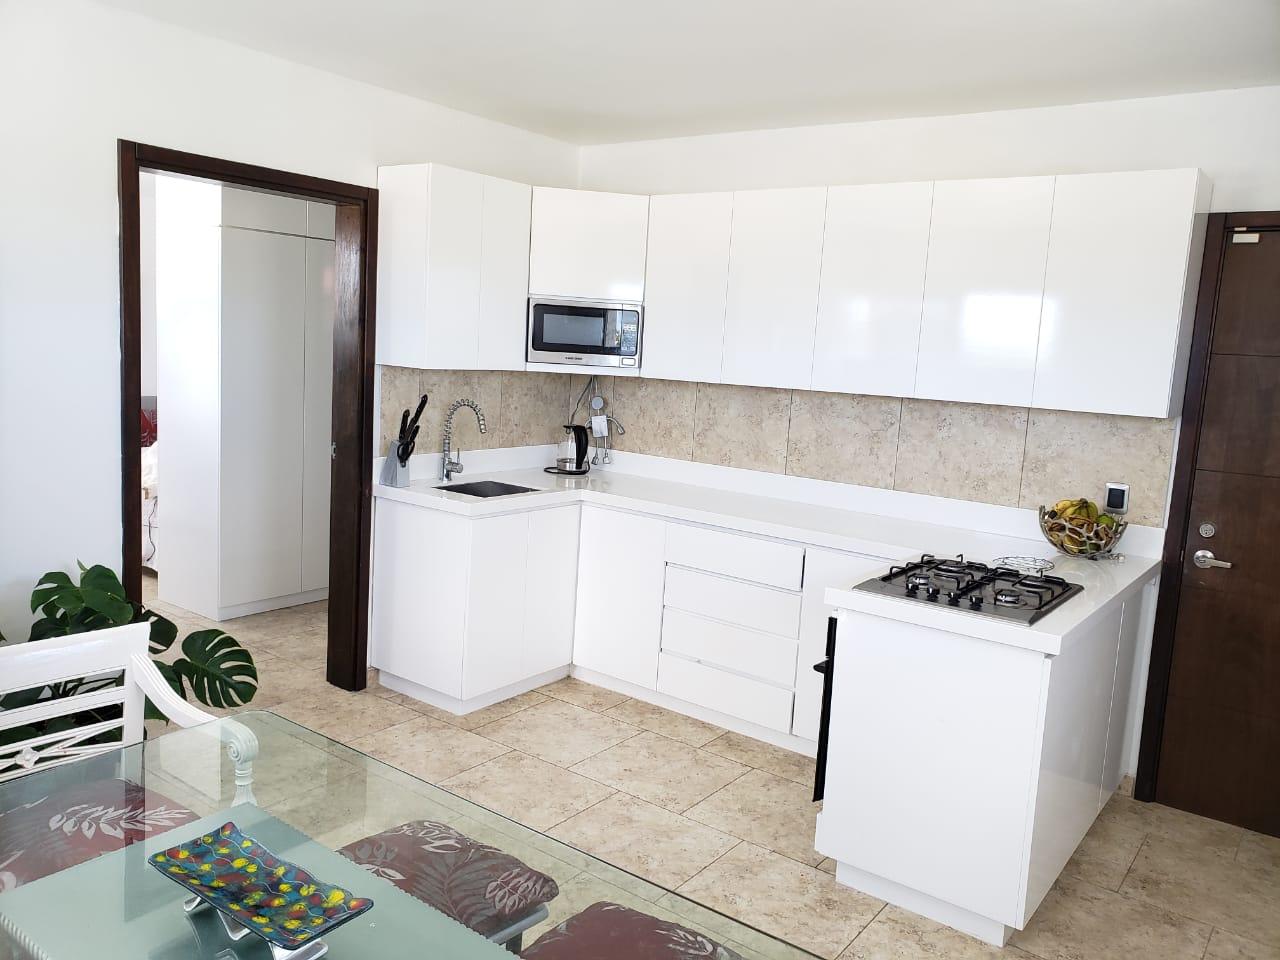 1-Bedroom Furnished Apartment in Seroe Blanco - Aruba Real ...